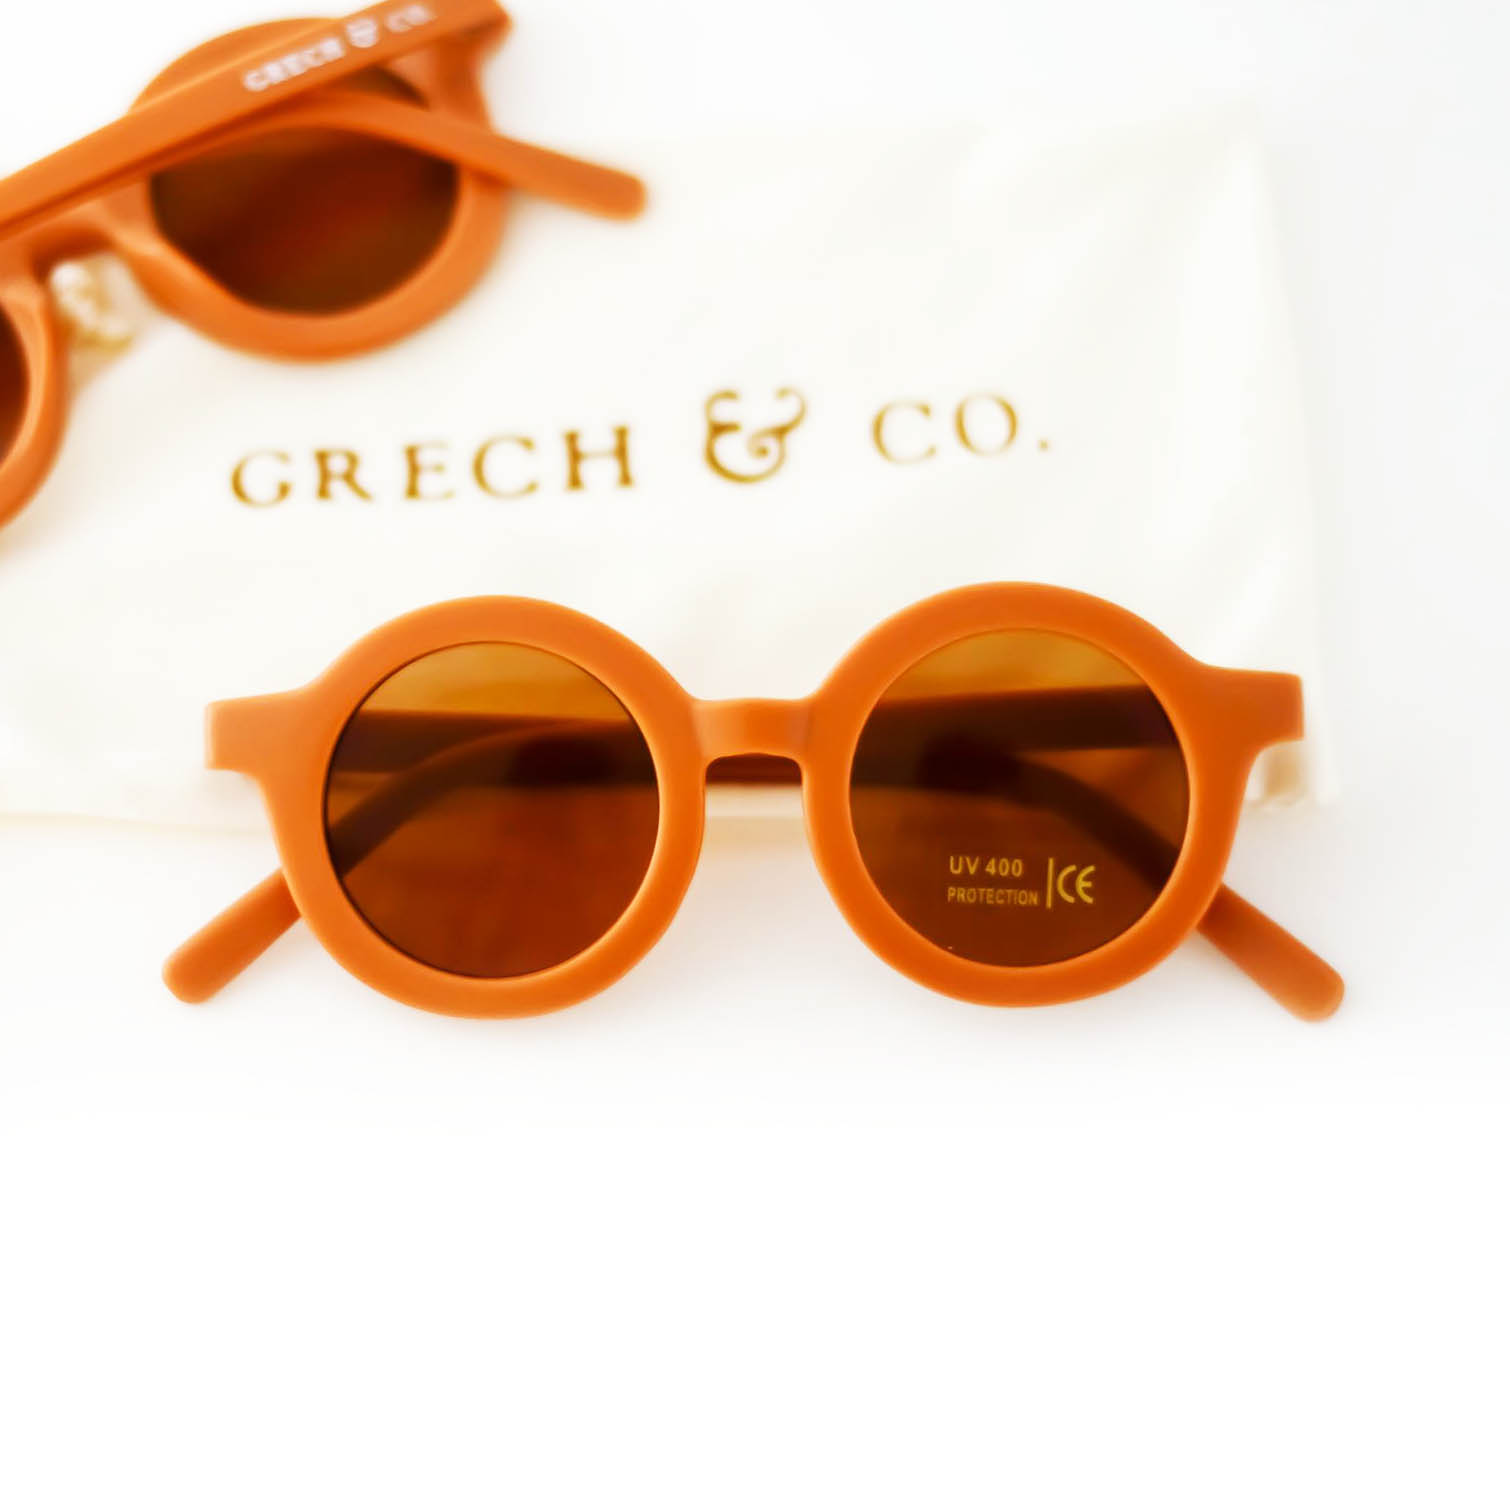 Original Round Sunglasses Made of Recycled Materials Spice